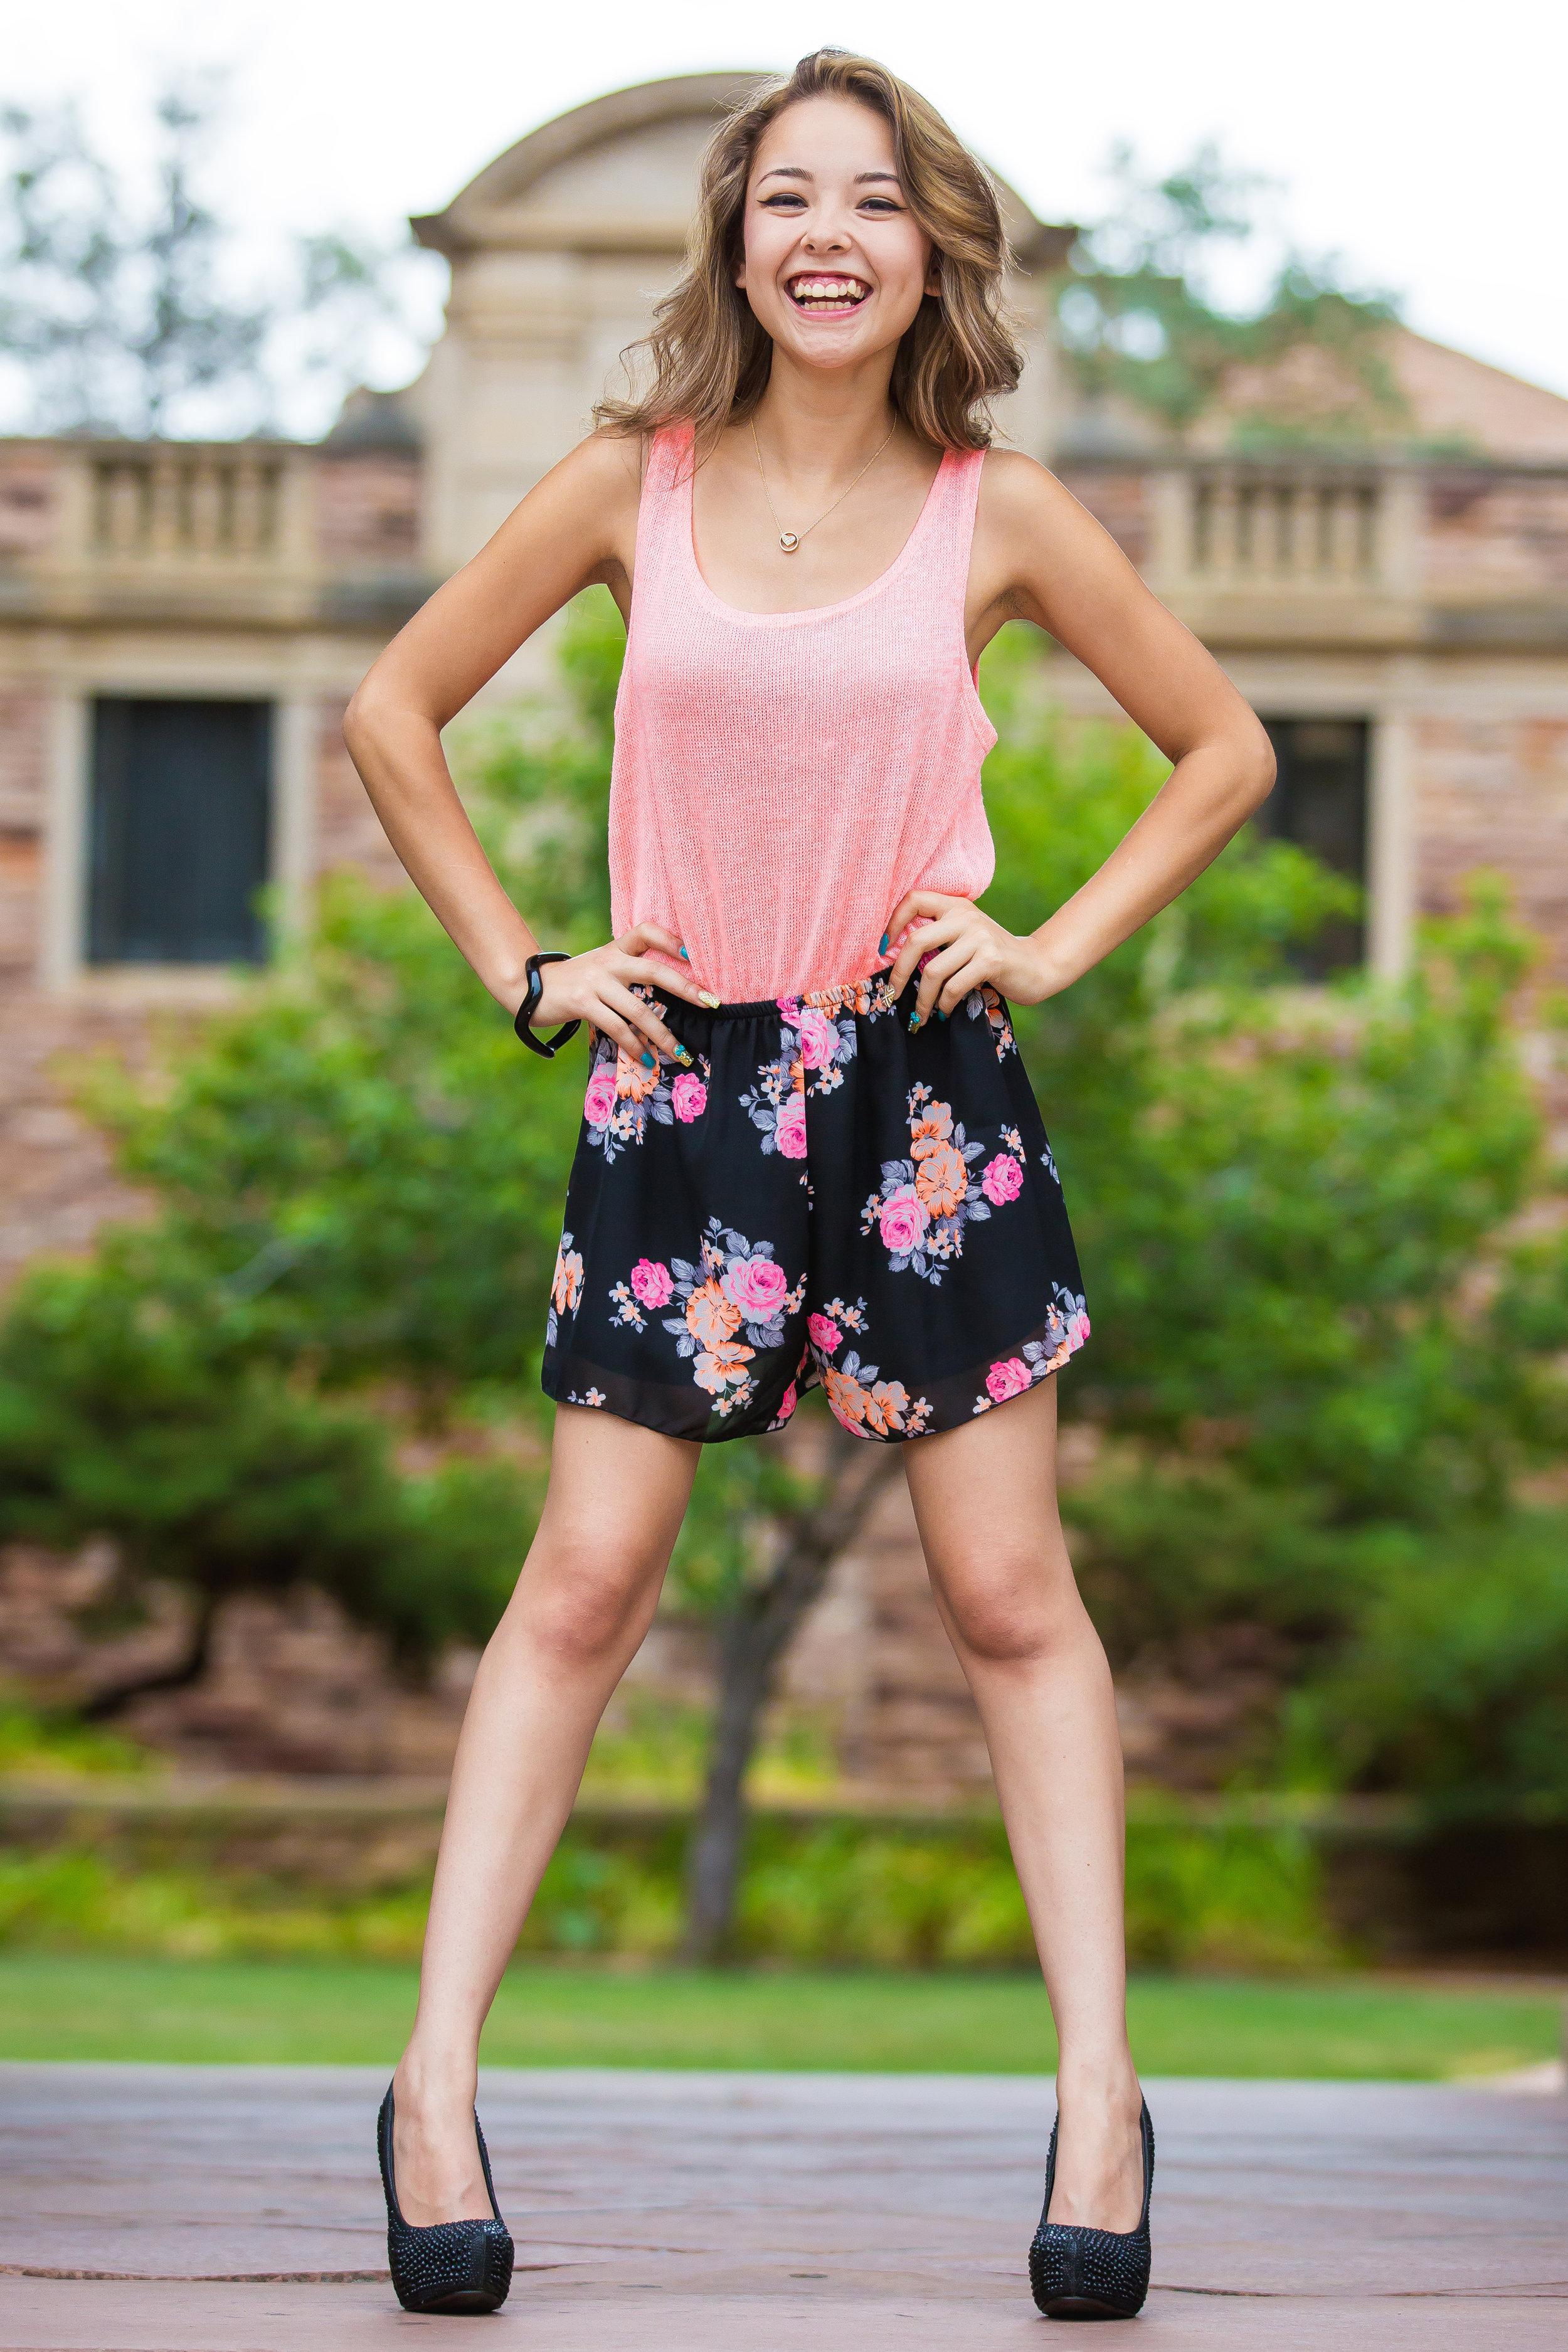 Selina Ramirez_Think Darryl Photography_Denver Senior Portrait Photographer -2 copy.jpg